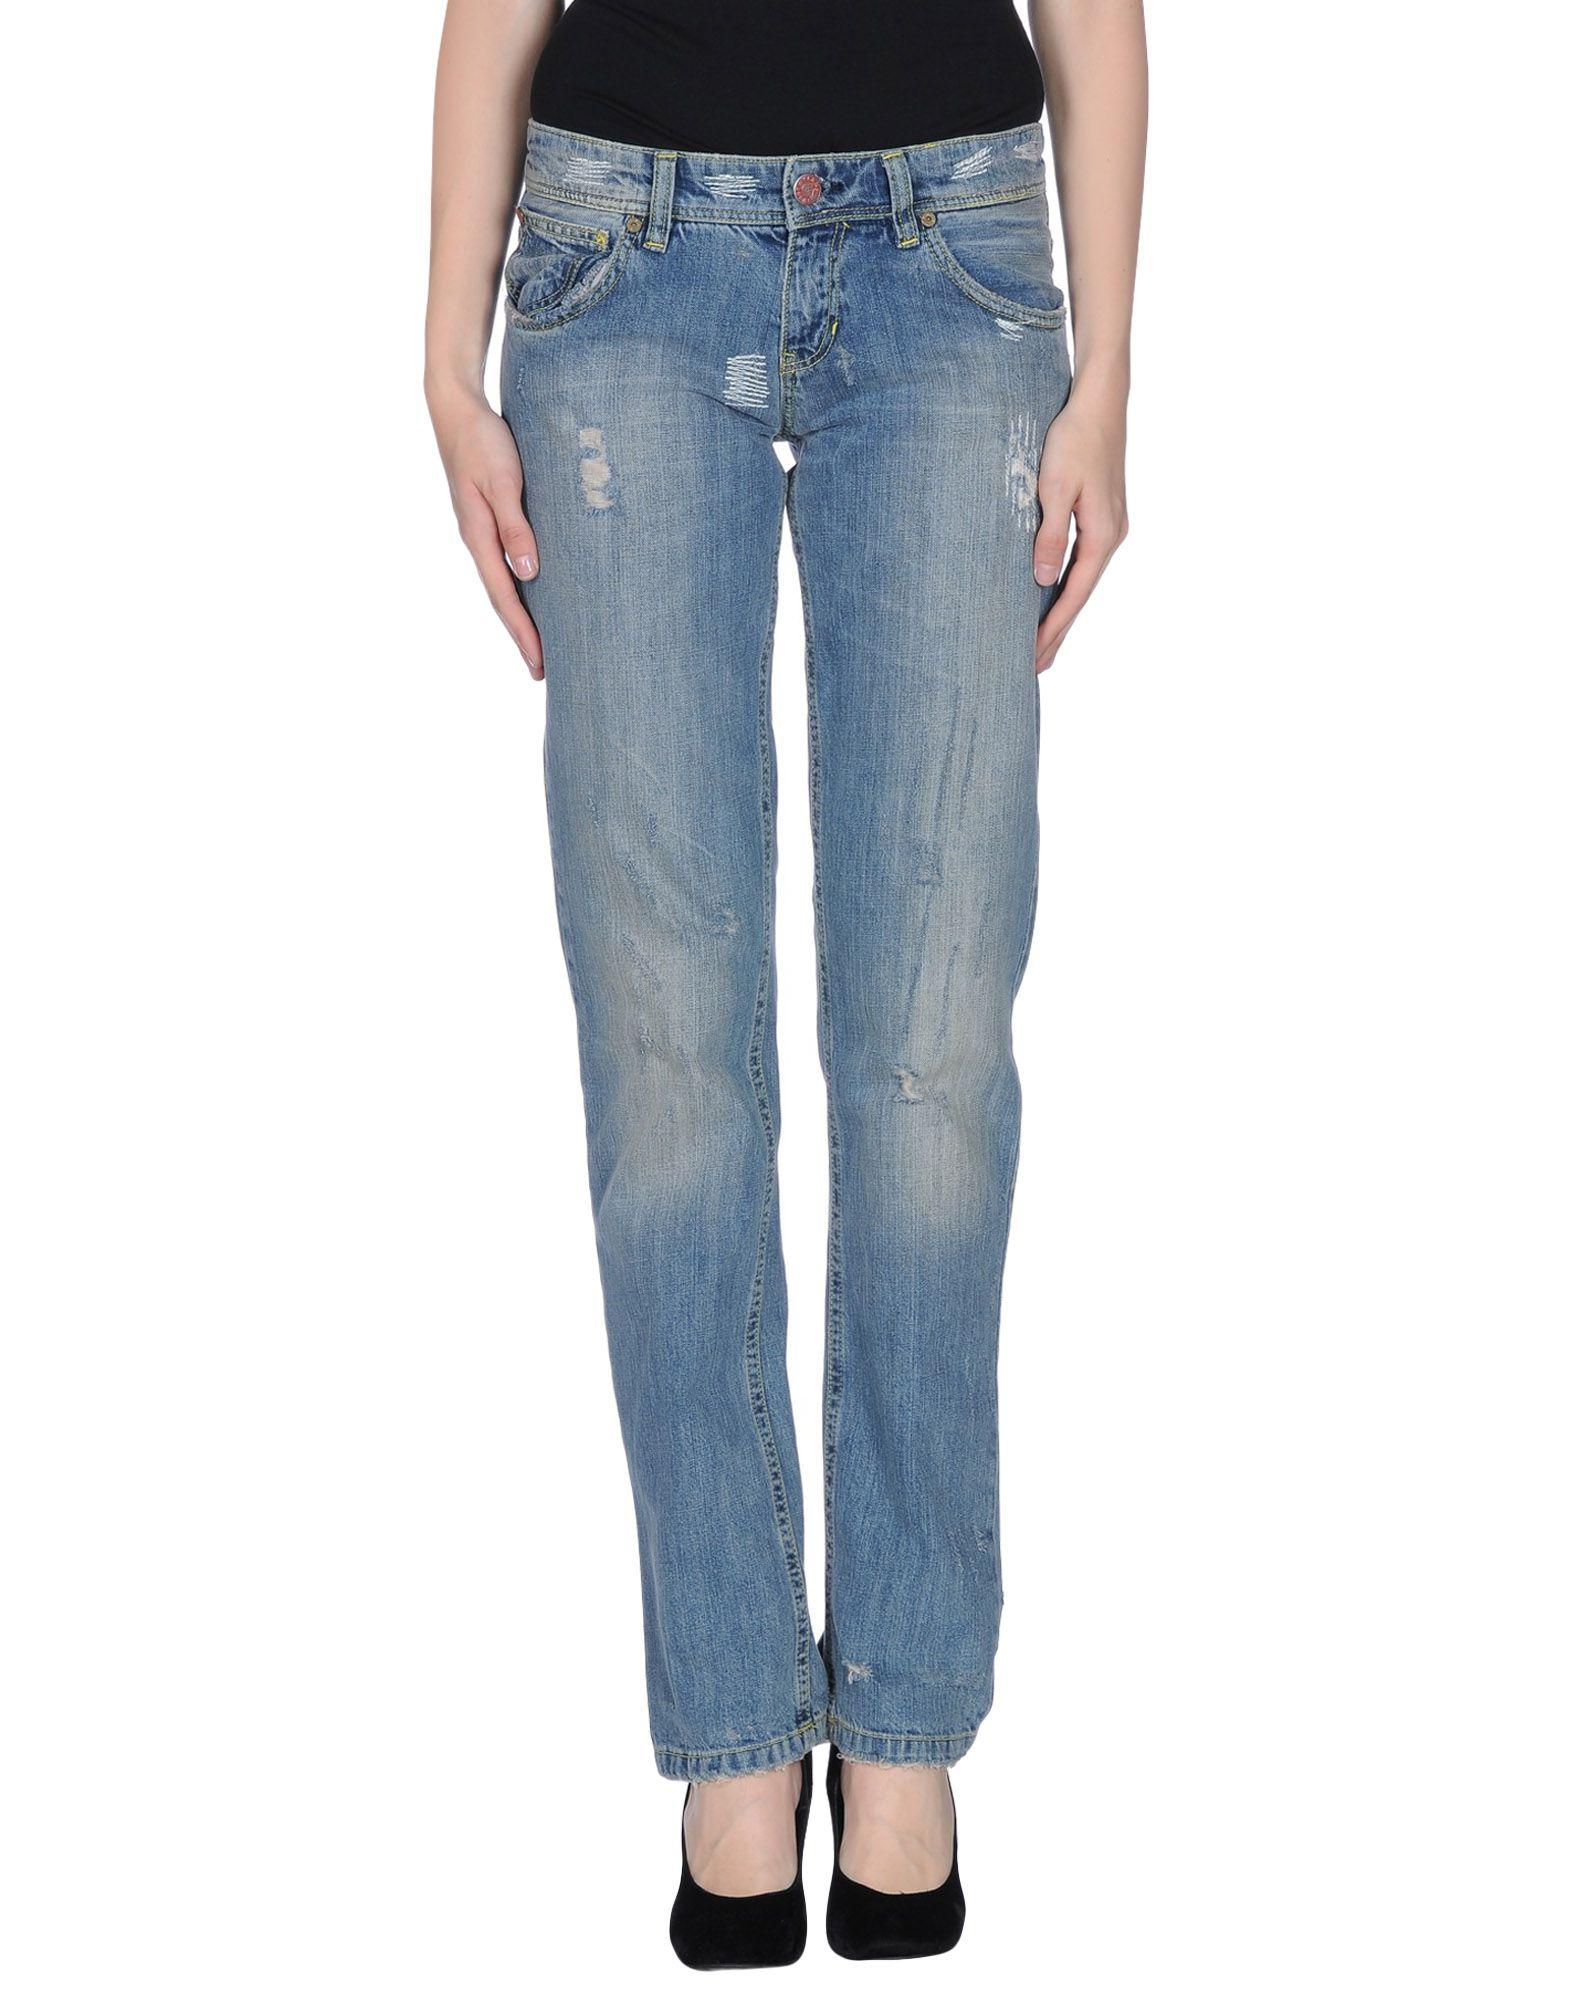 SWEET YEARS Джинсовые брюки 3 years warranty 100